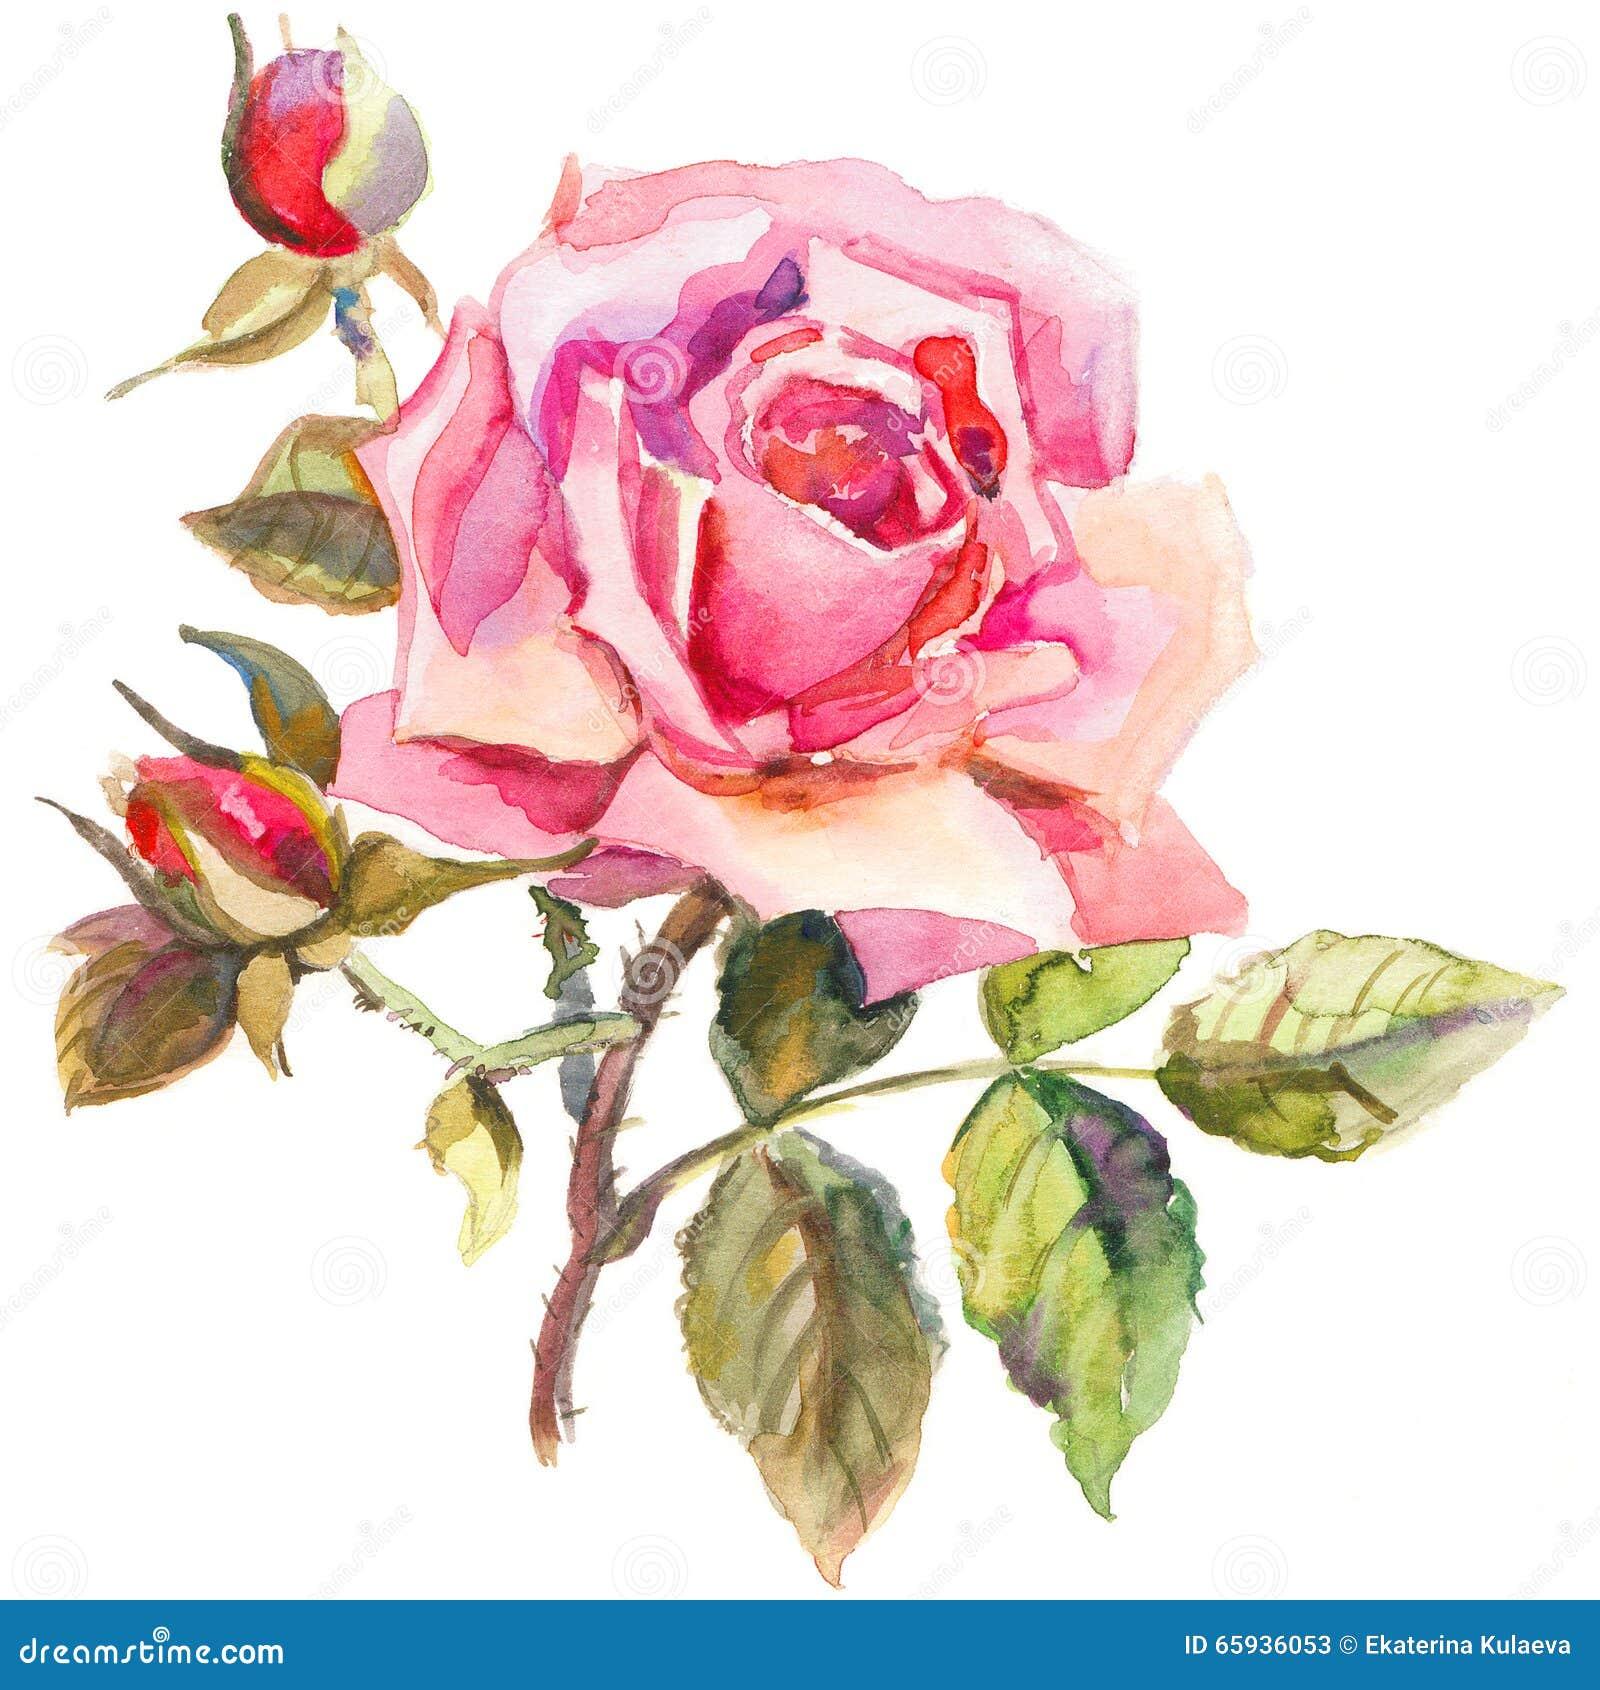 Dibujo Elegante De La Flor Color De Rosa En Estilo De La Acuarela